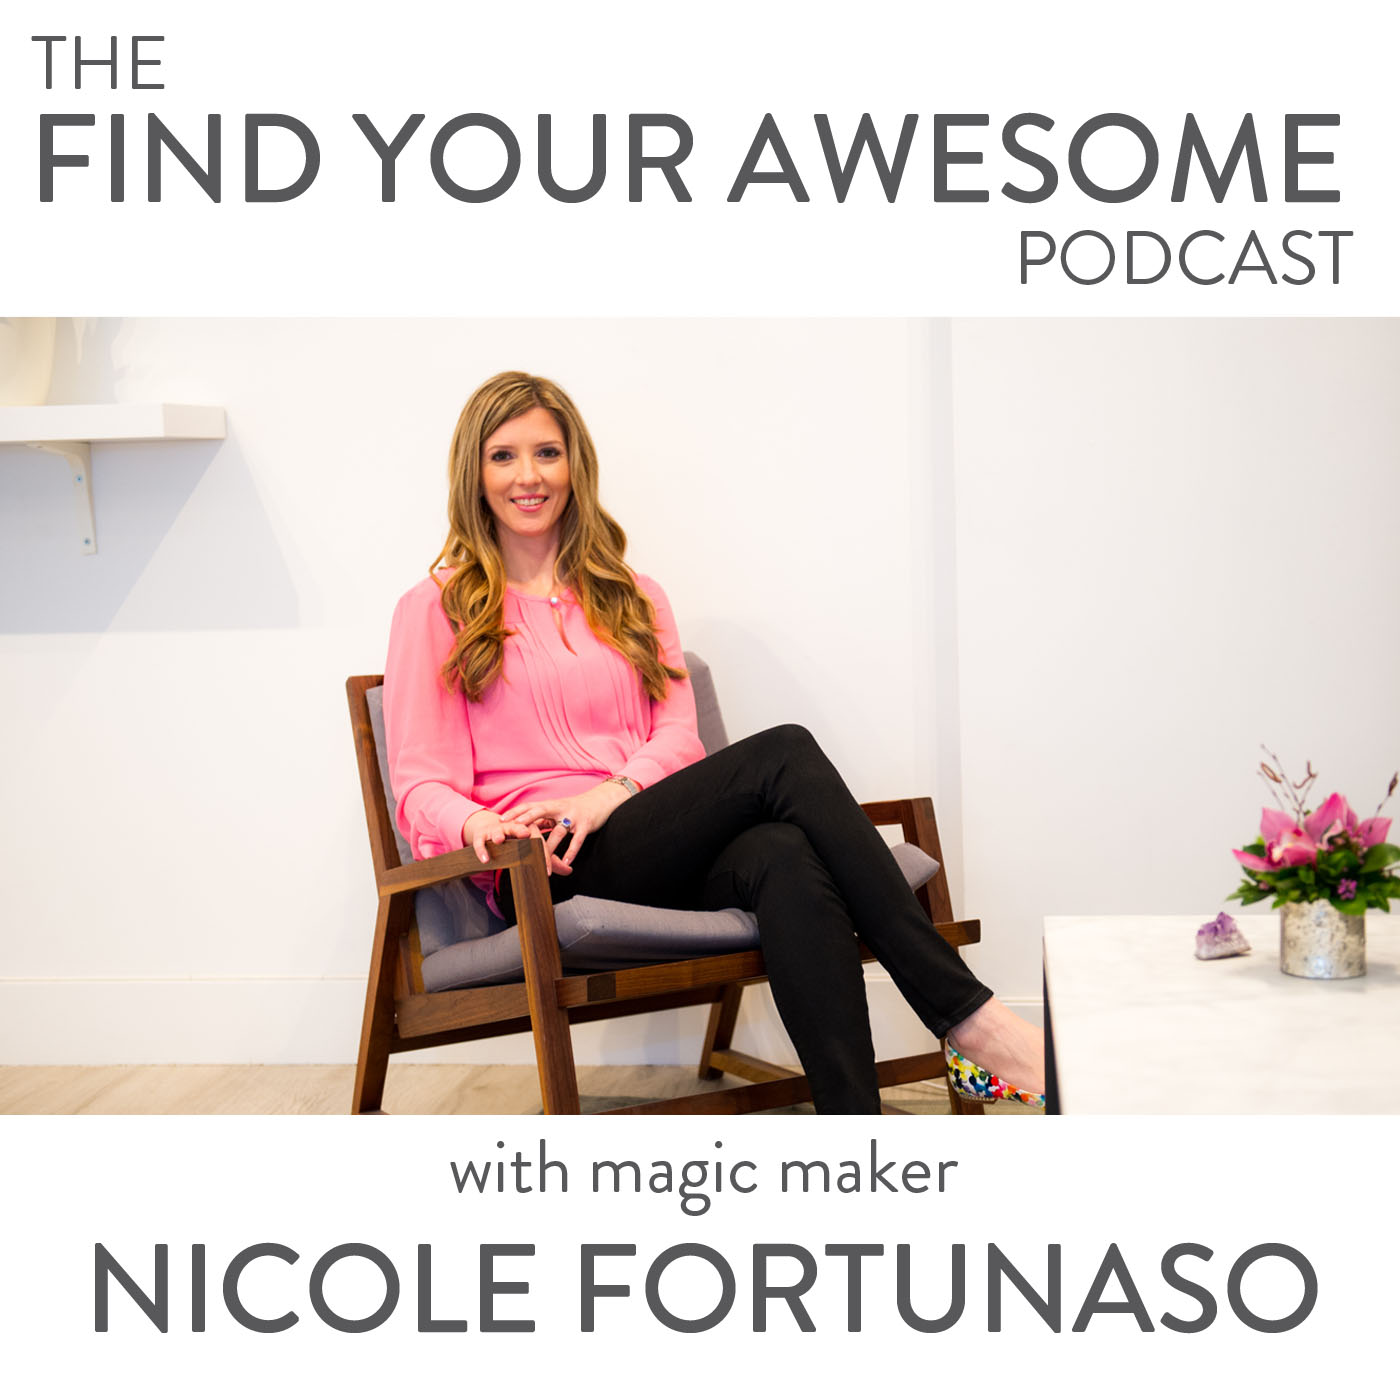 NicoleFortunaso_podcast_coverart.jpg